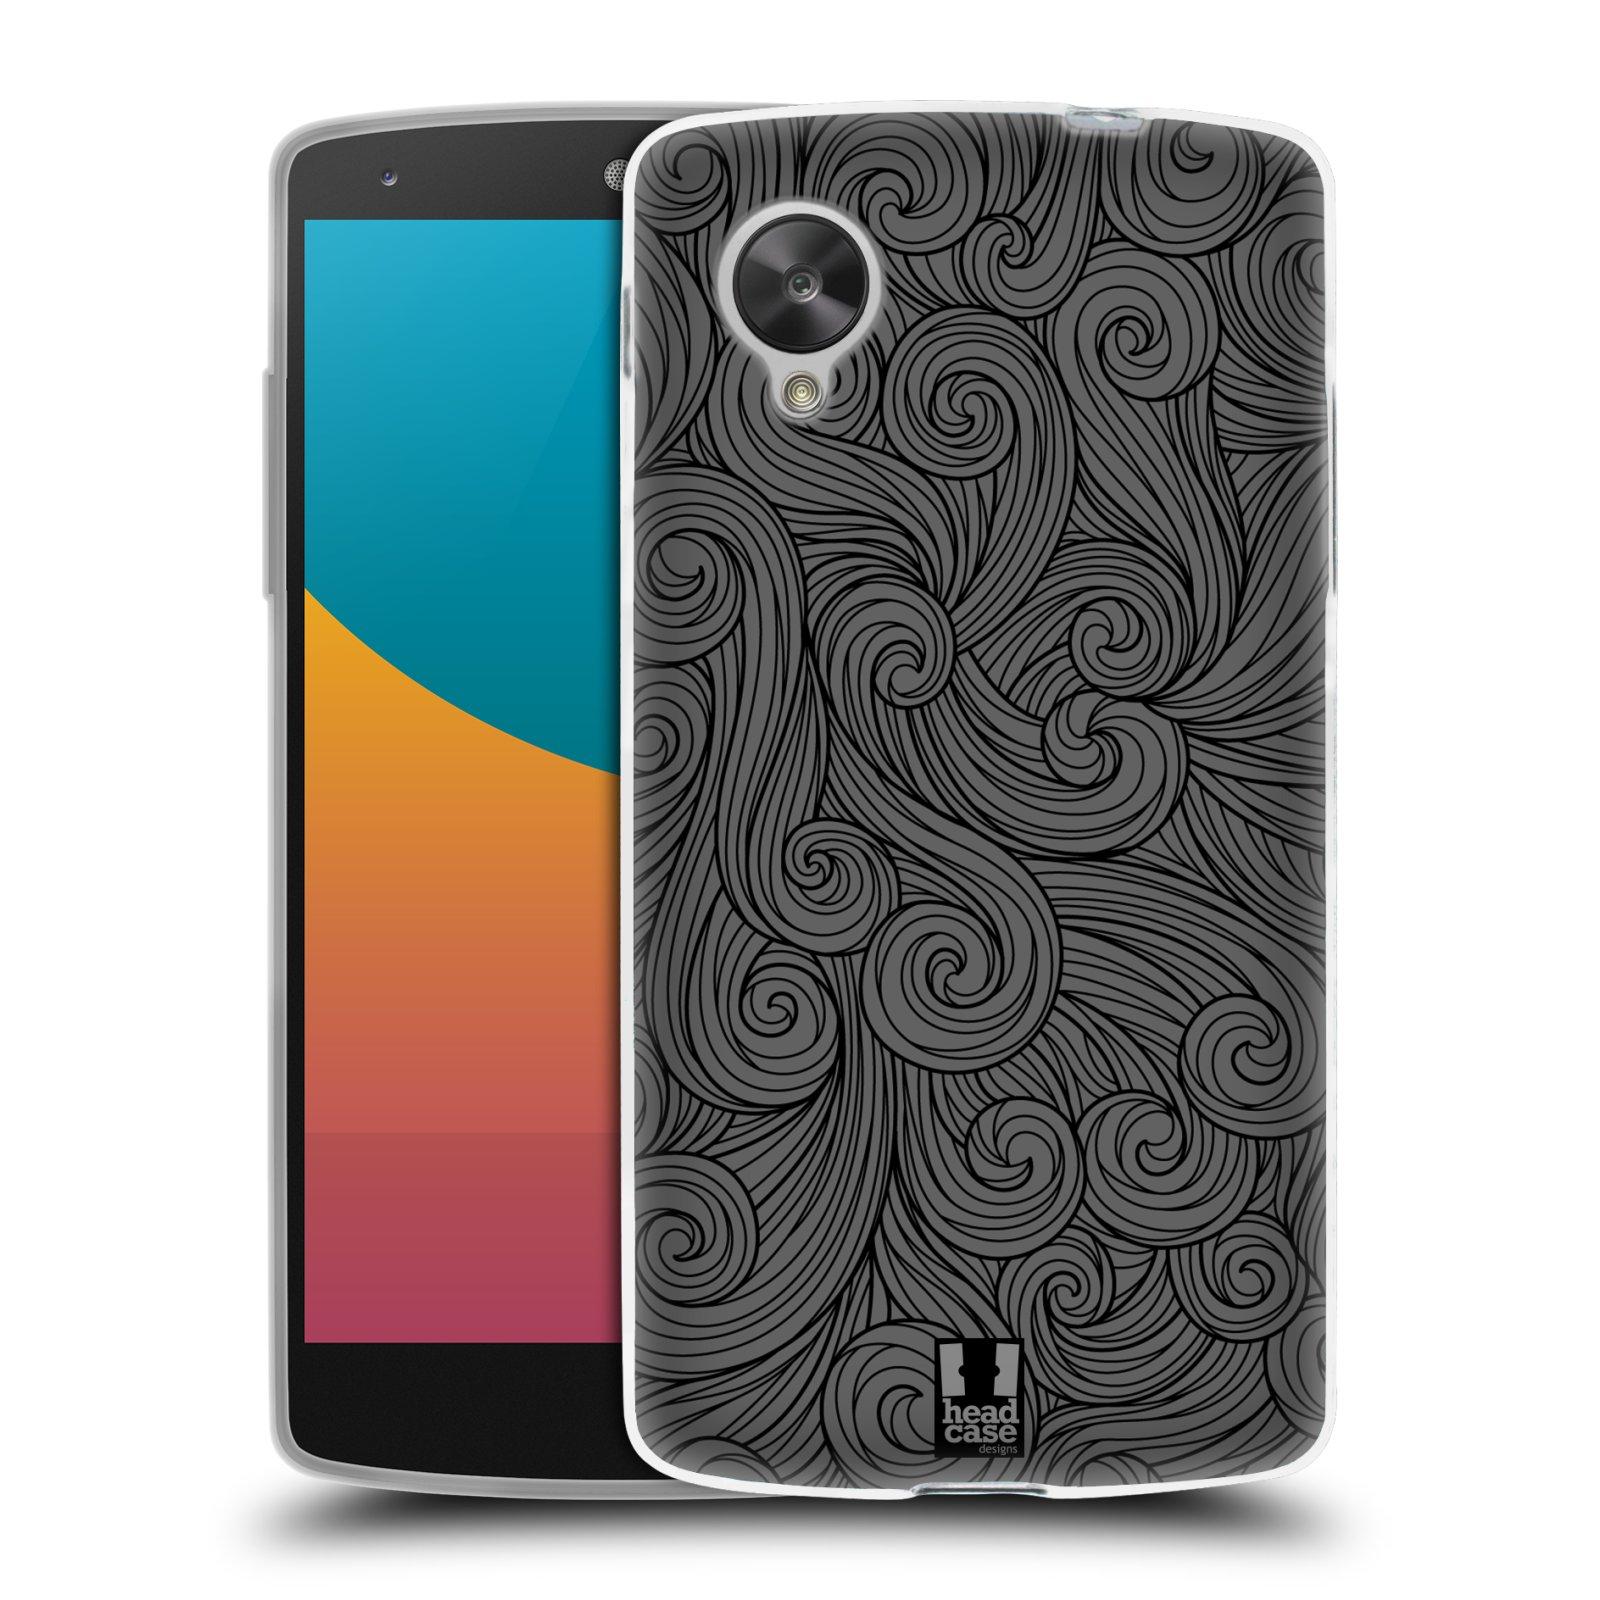 Silikonové pouzdro na mobil LG Nexus 5 HEAD CASE Dark Grey Swirls (Silikonový kryt či obal na mobilní telefon LG Google Nexus 5 D821)